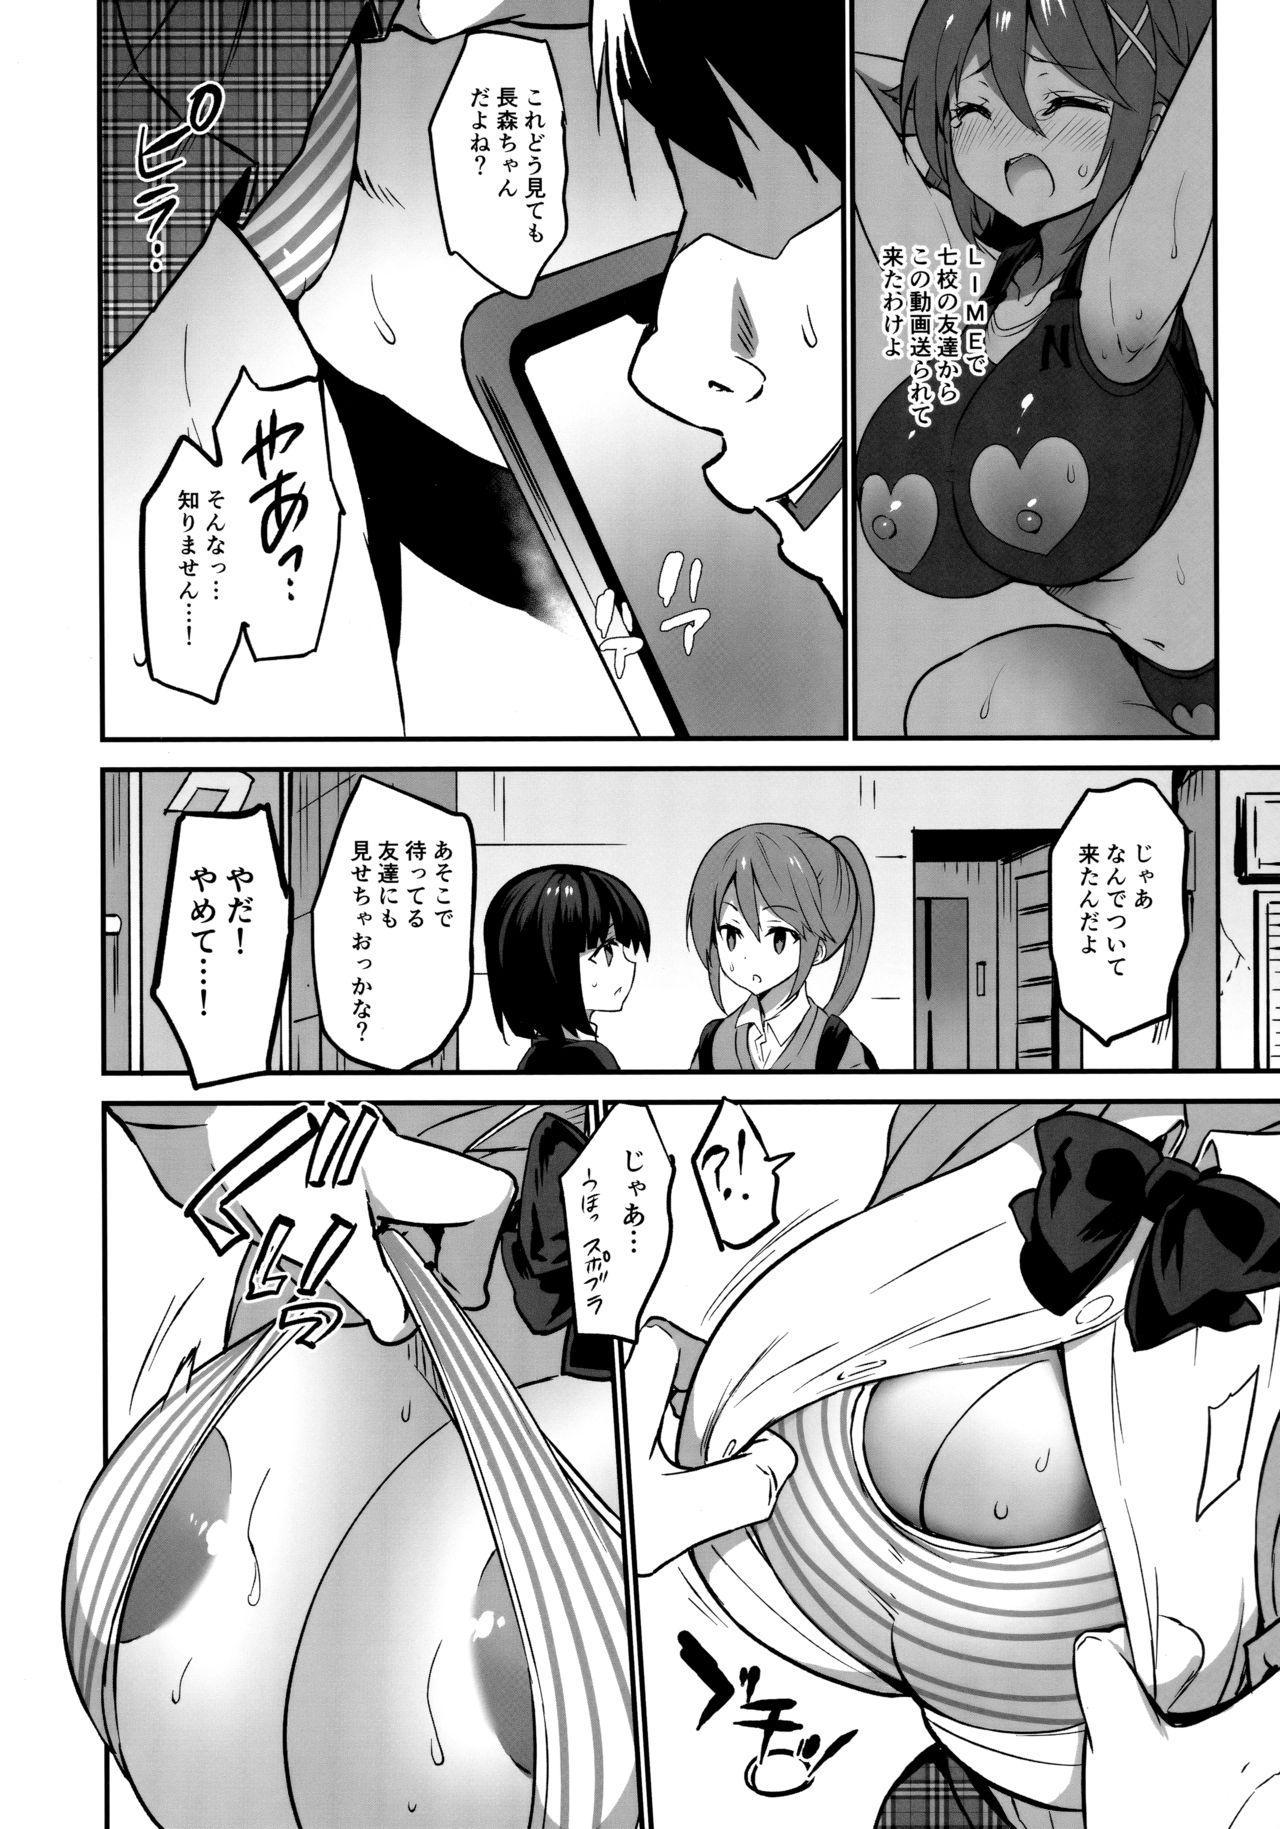 Gakkou de Seishun! 17 6